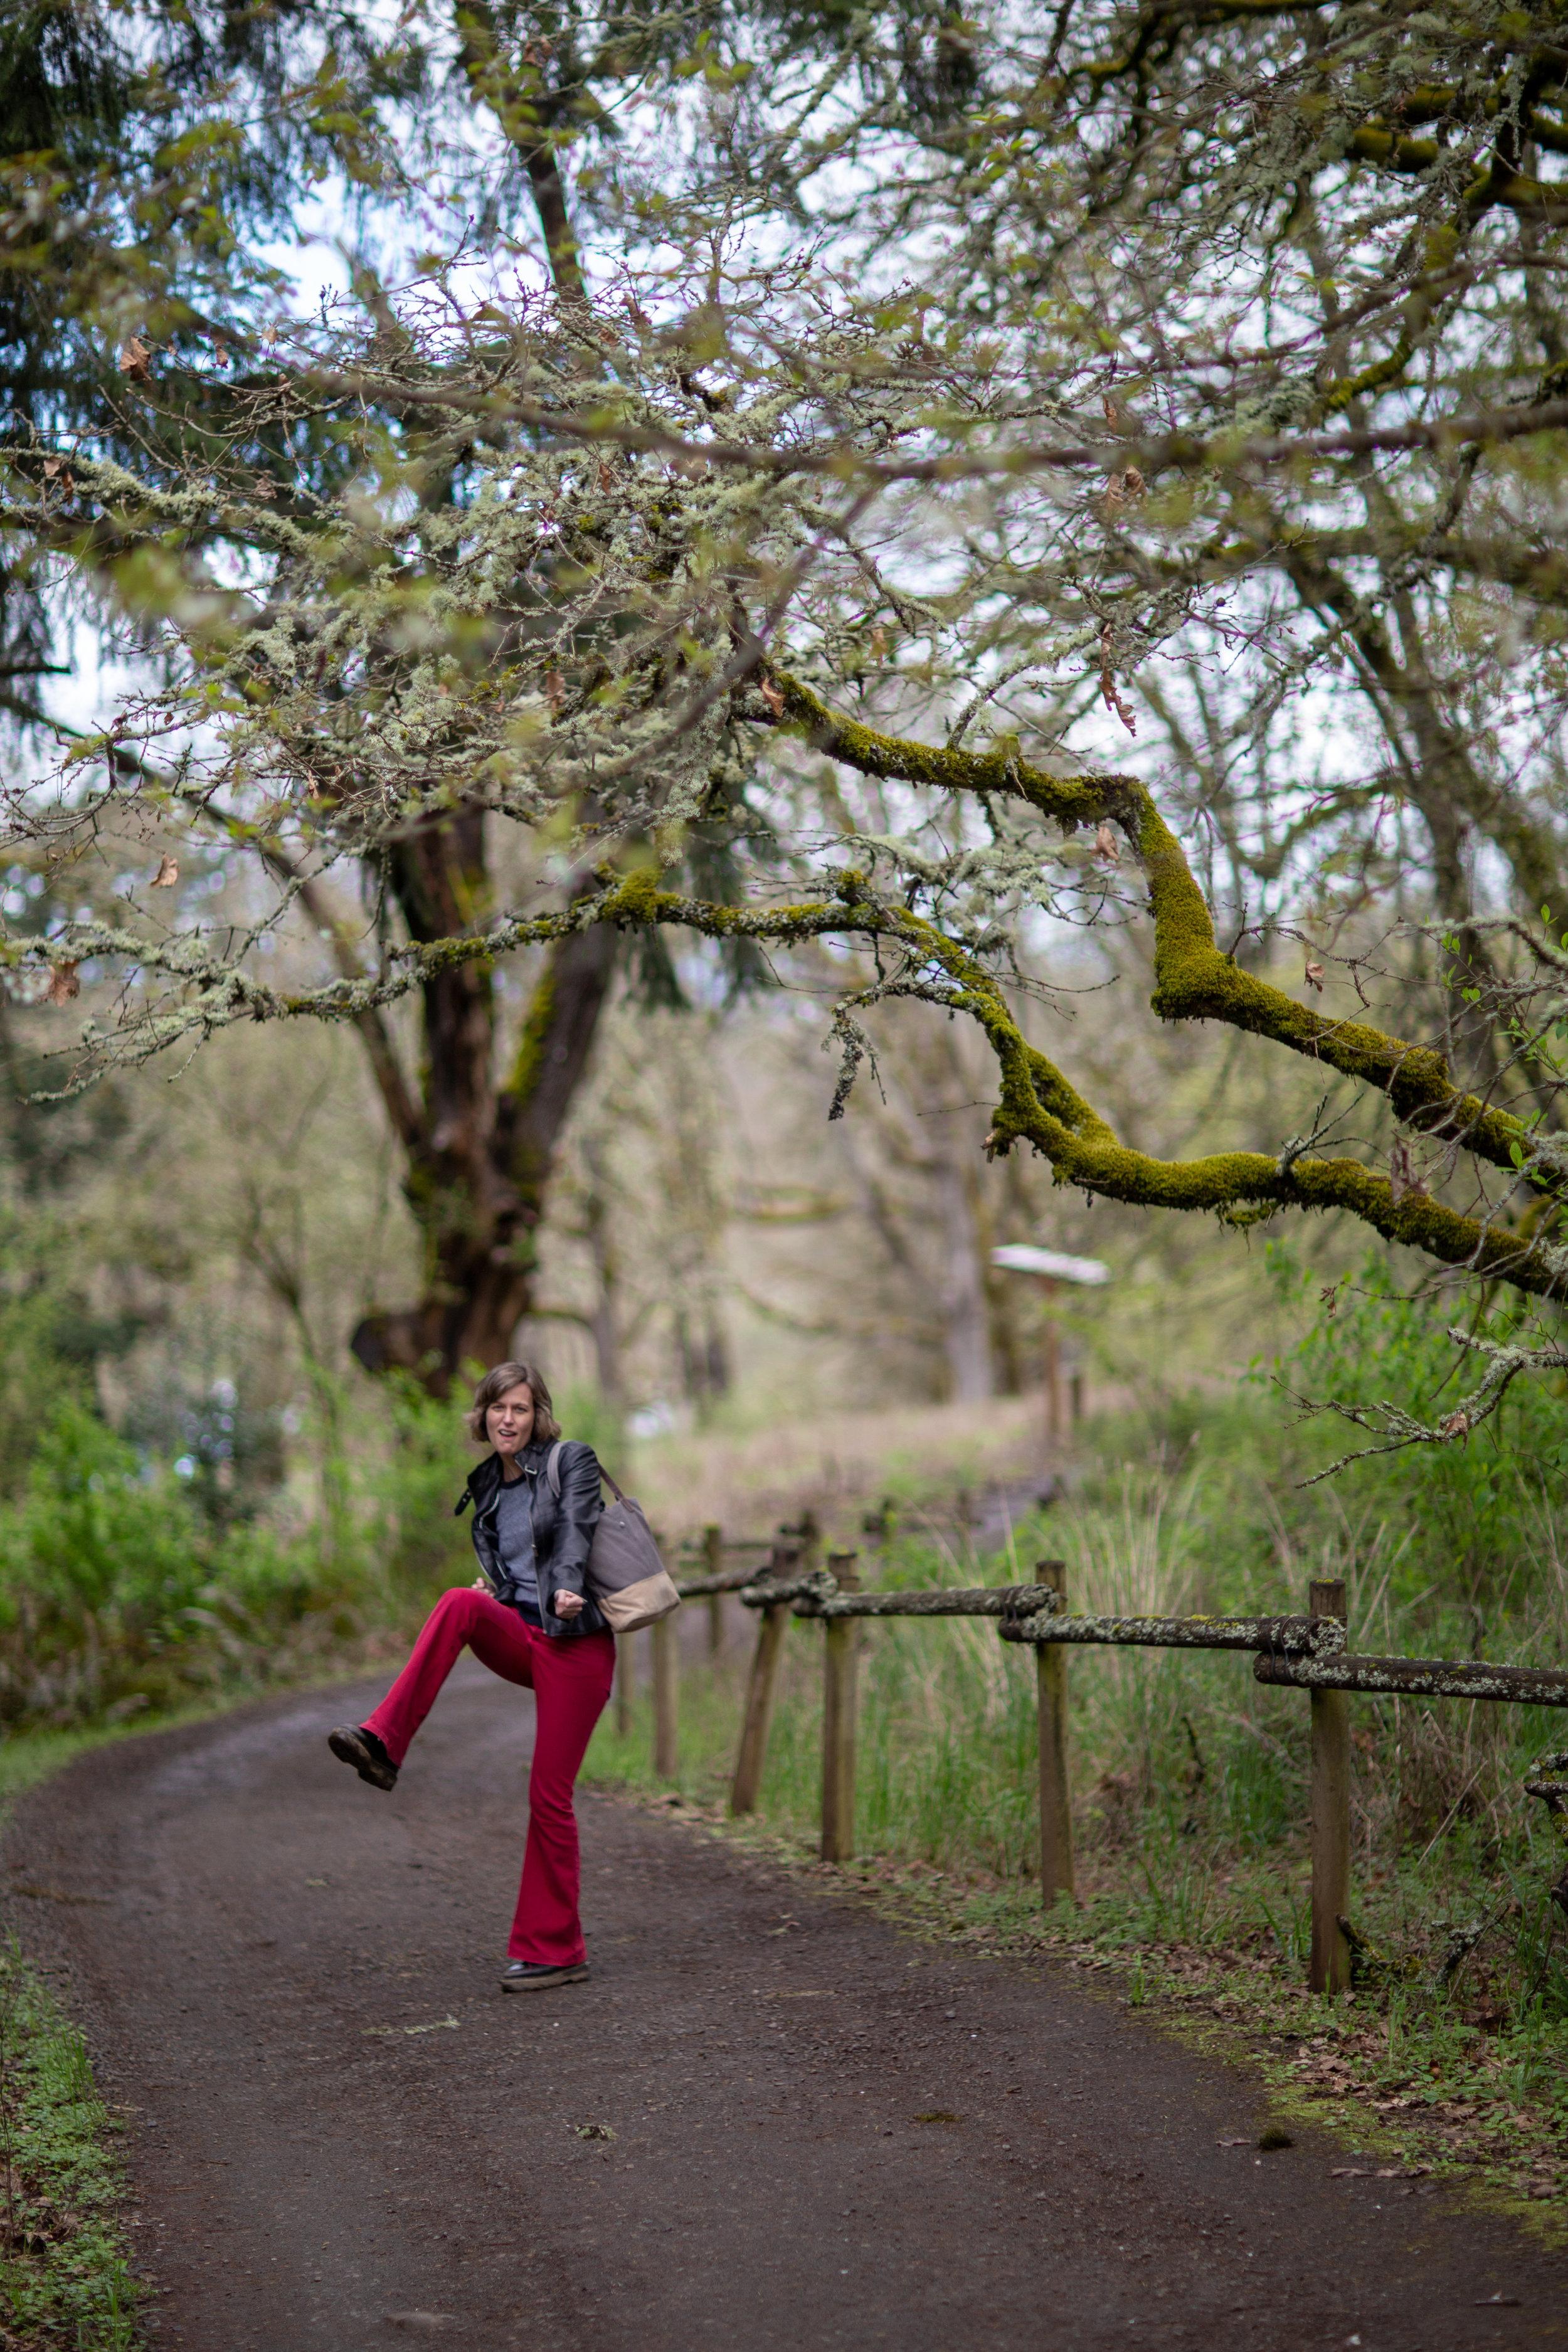 Elaine having fun among the ancient oaks